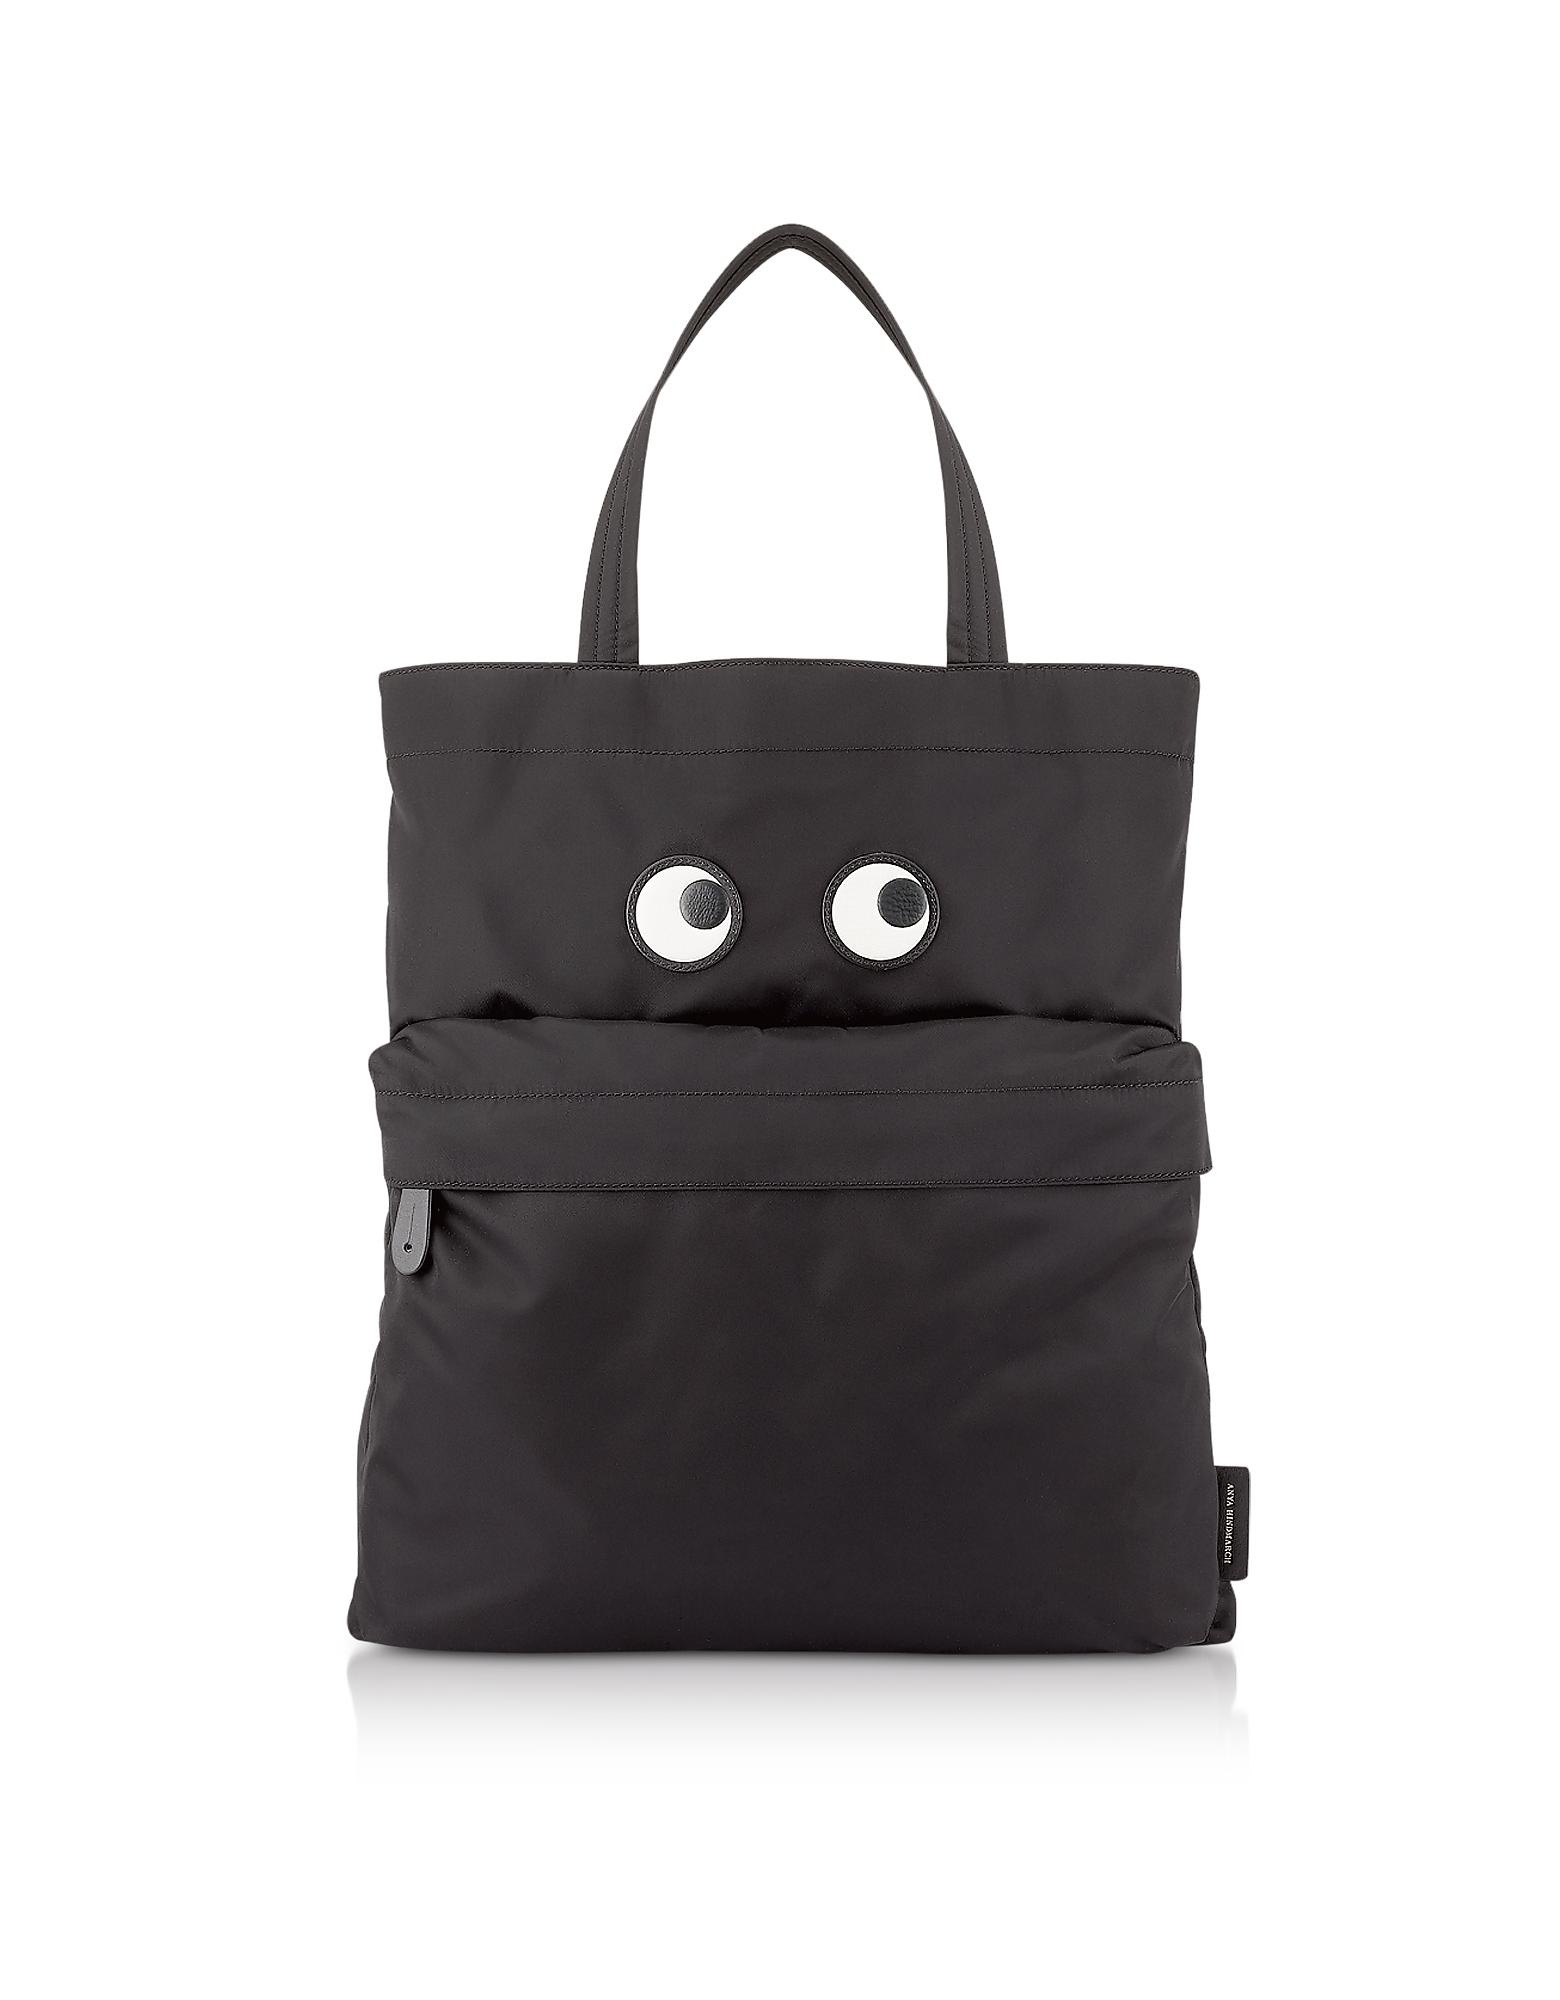 Black Nylon Eye Tote Bag